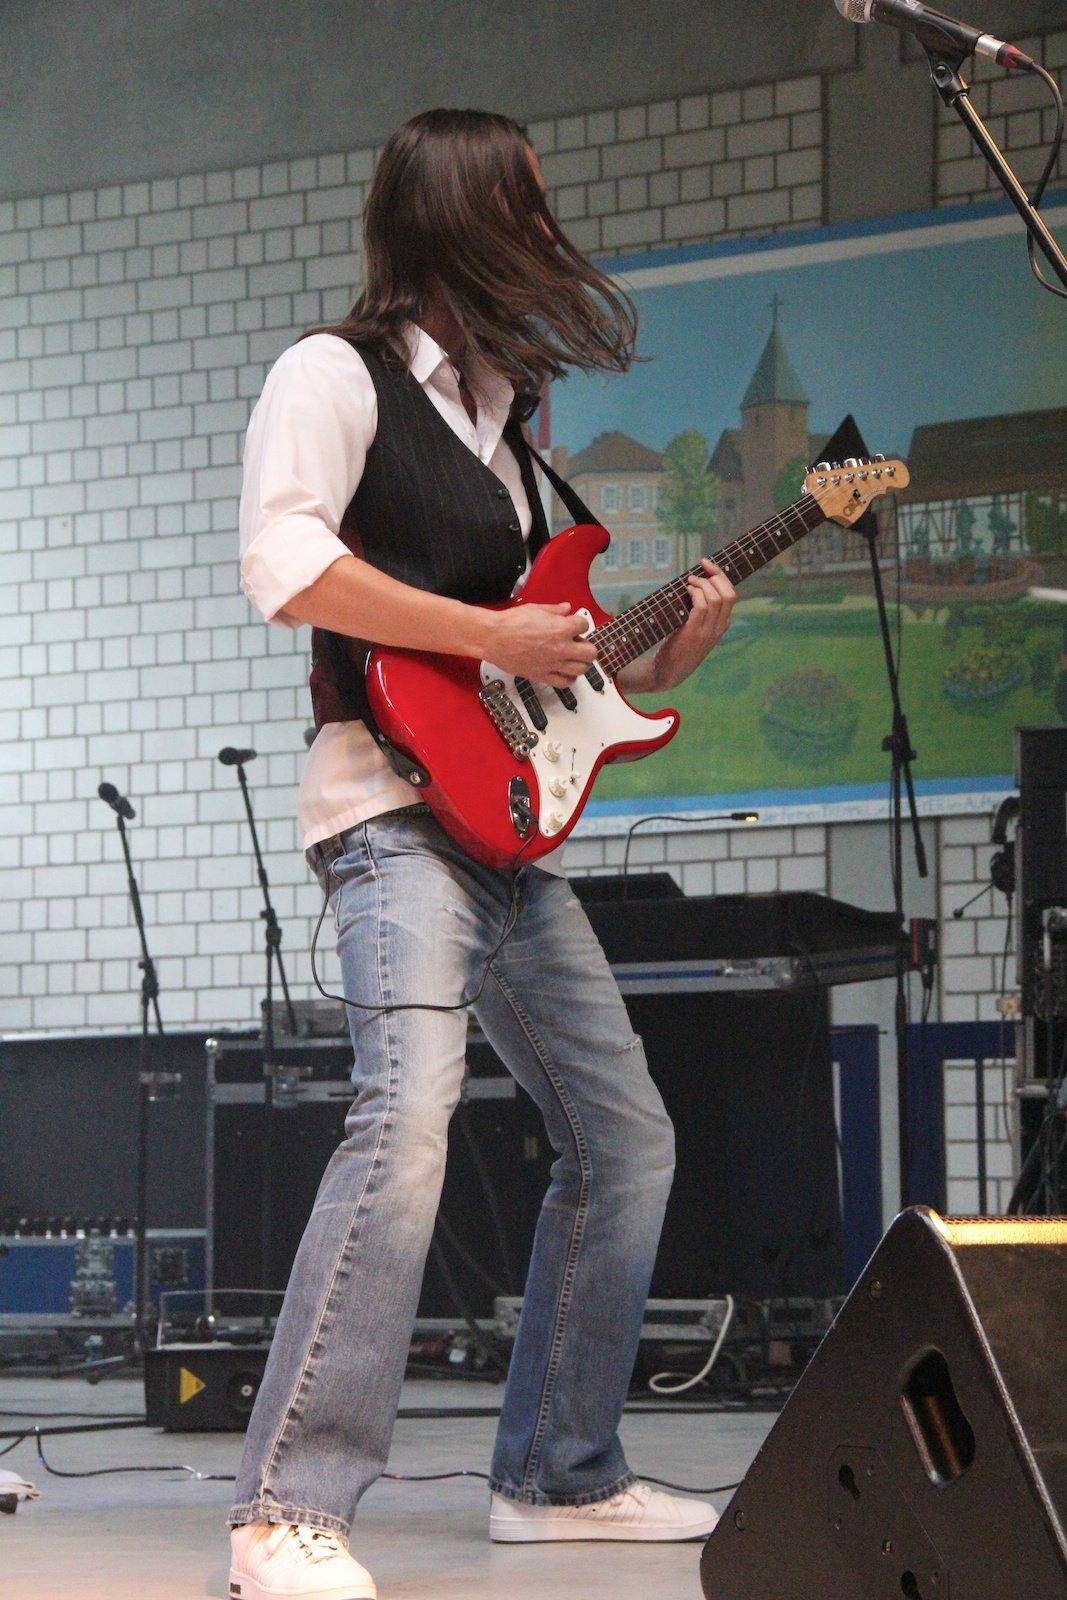 Stainless Quo - Sommerfesthalle, Otterstadt 18.06.2011 - 22